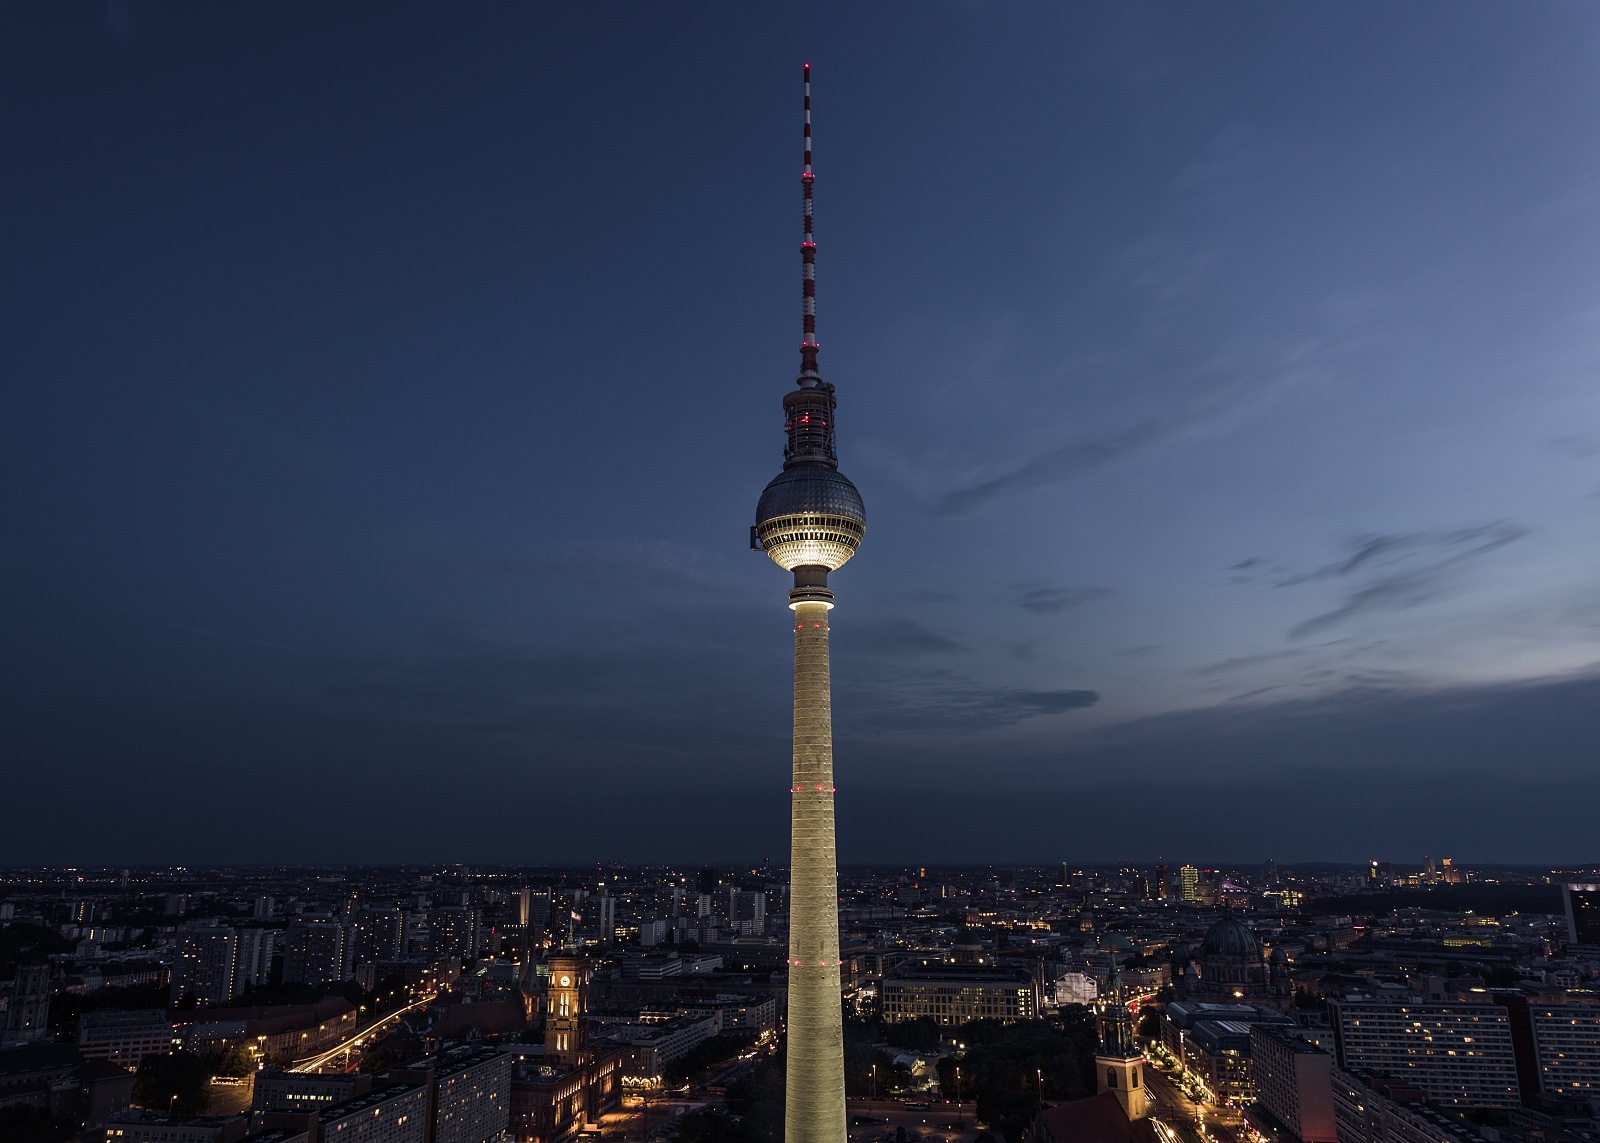 Fernsehturm in twilight